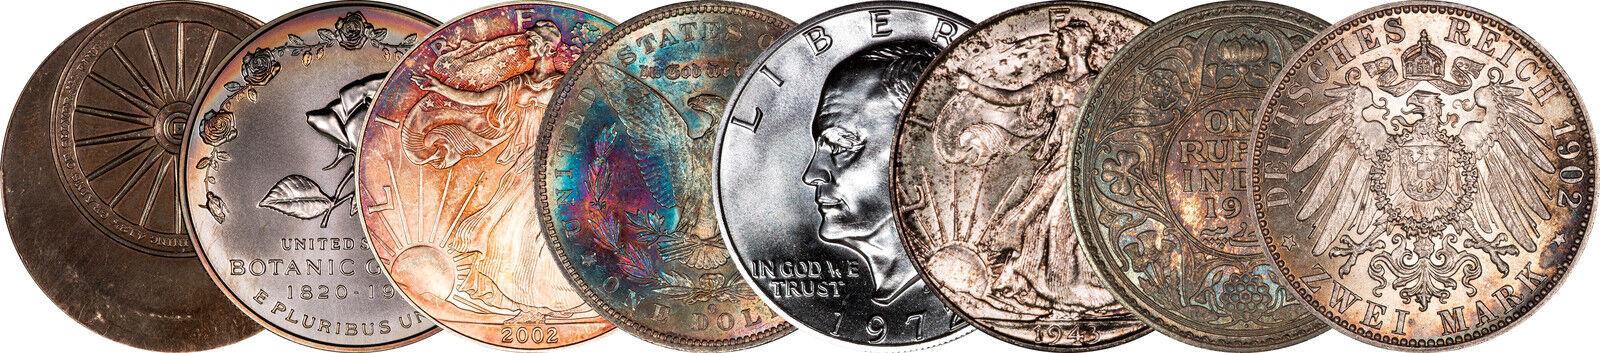 defcat_numismatics